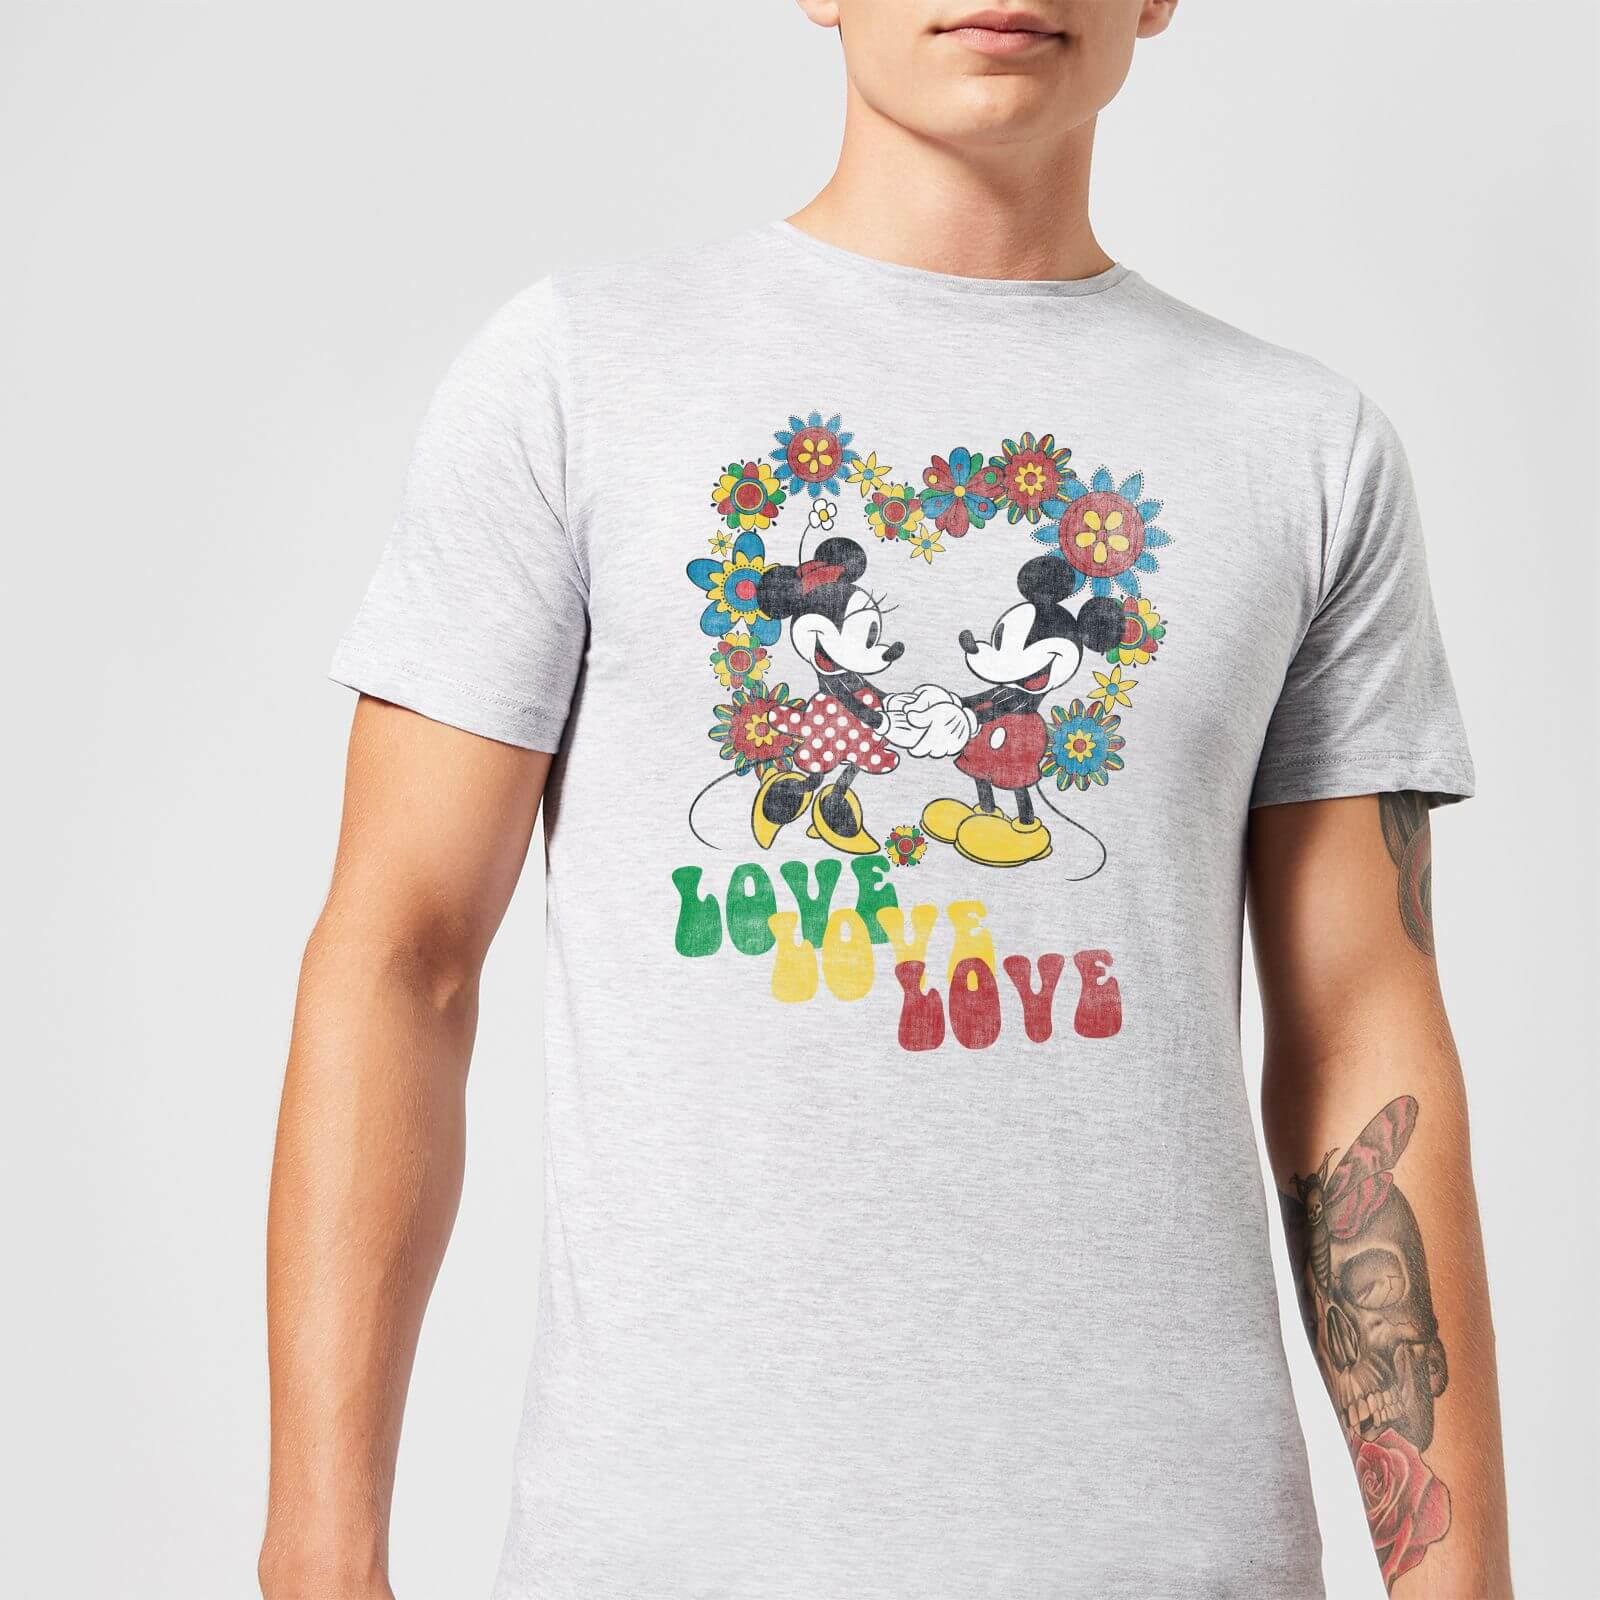 Disney Mickey Mouse Hippie Love T-Shirt - Grey - 5XL - Grey